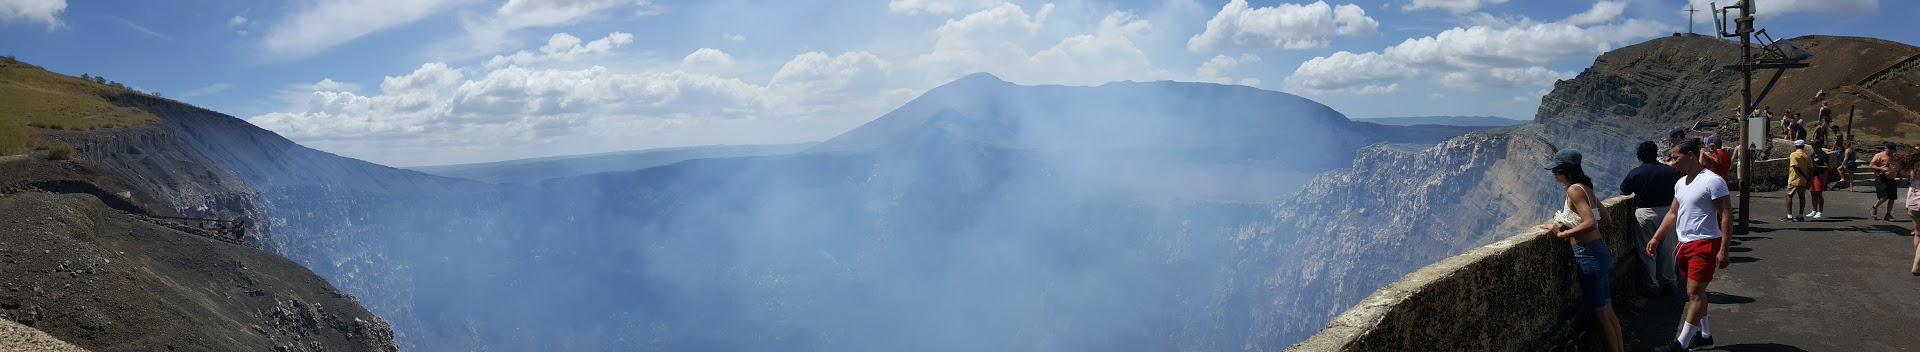 Nicaragua-For-You-Masaya-Volcano